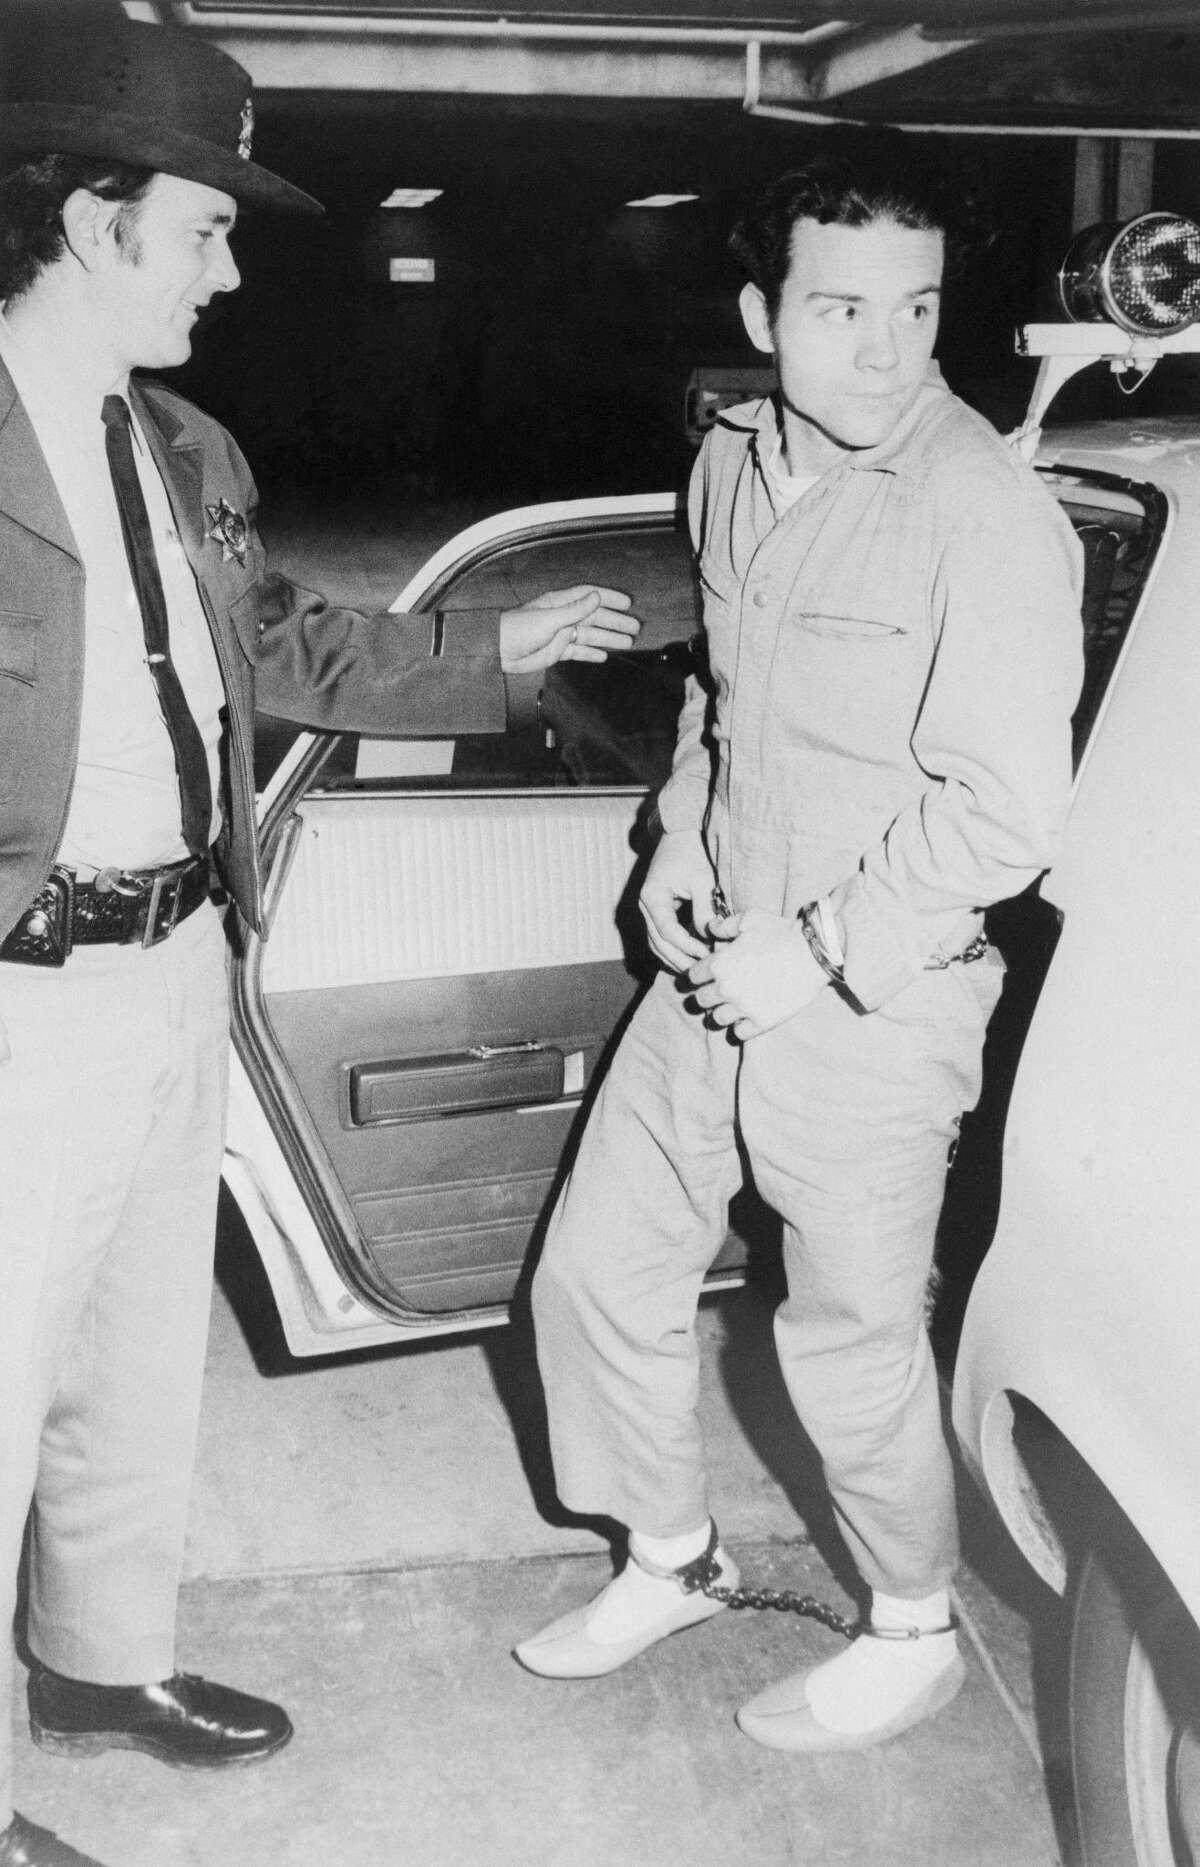 Herbert Mullin after being arrested for a string of murders in Santa Cruz.